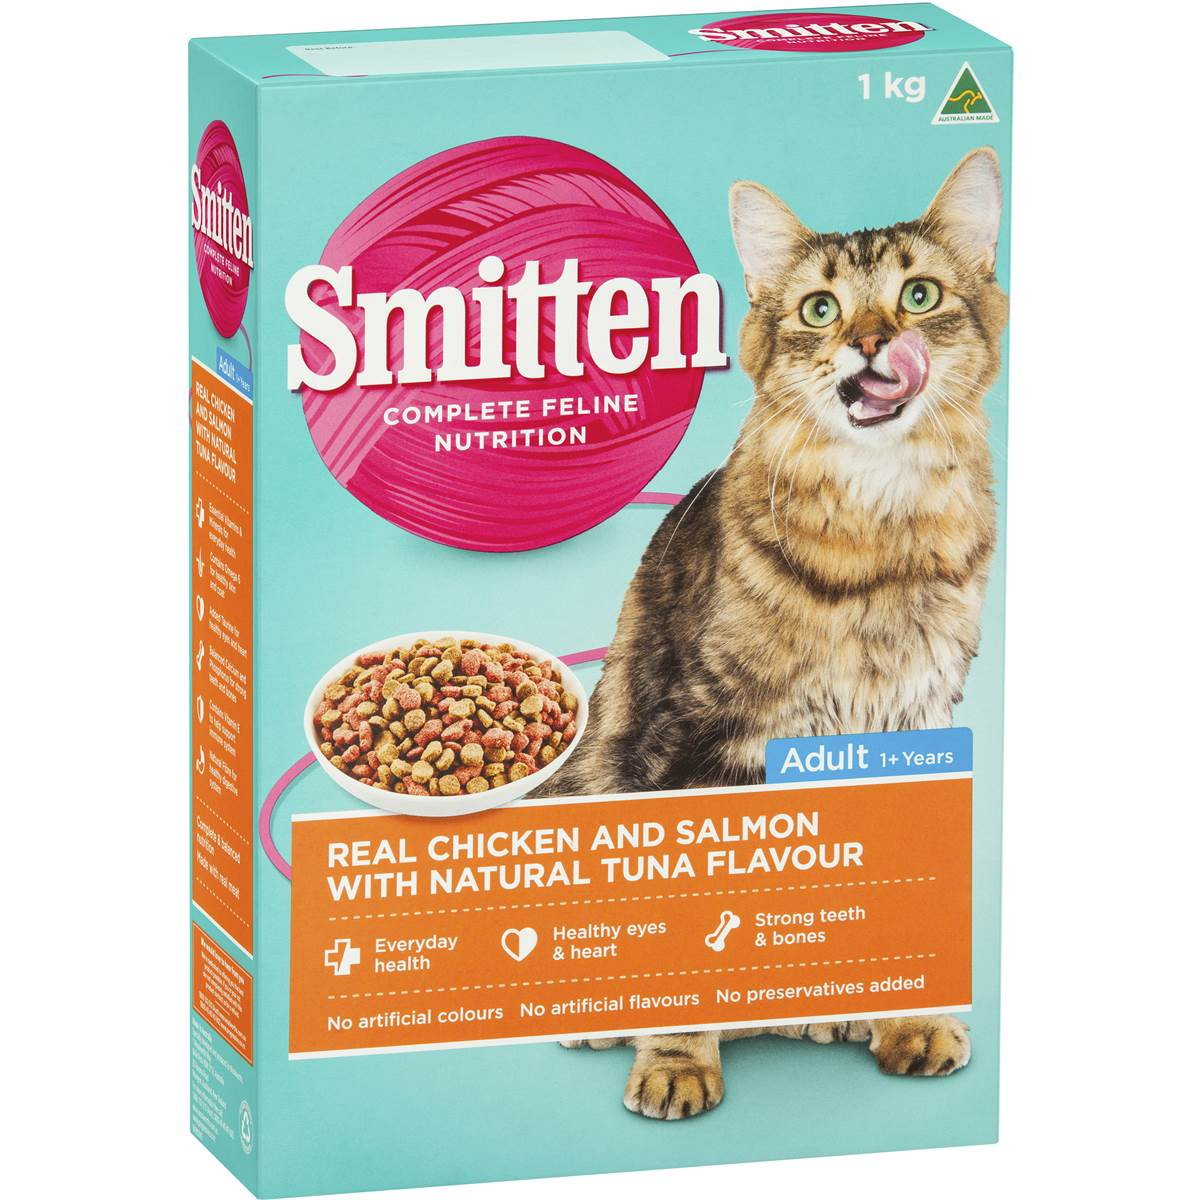 Smitten Woolworths Homebrand Pet Food Reviews Australia